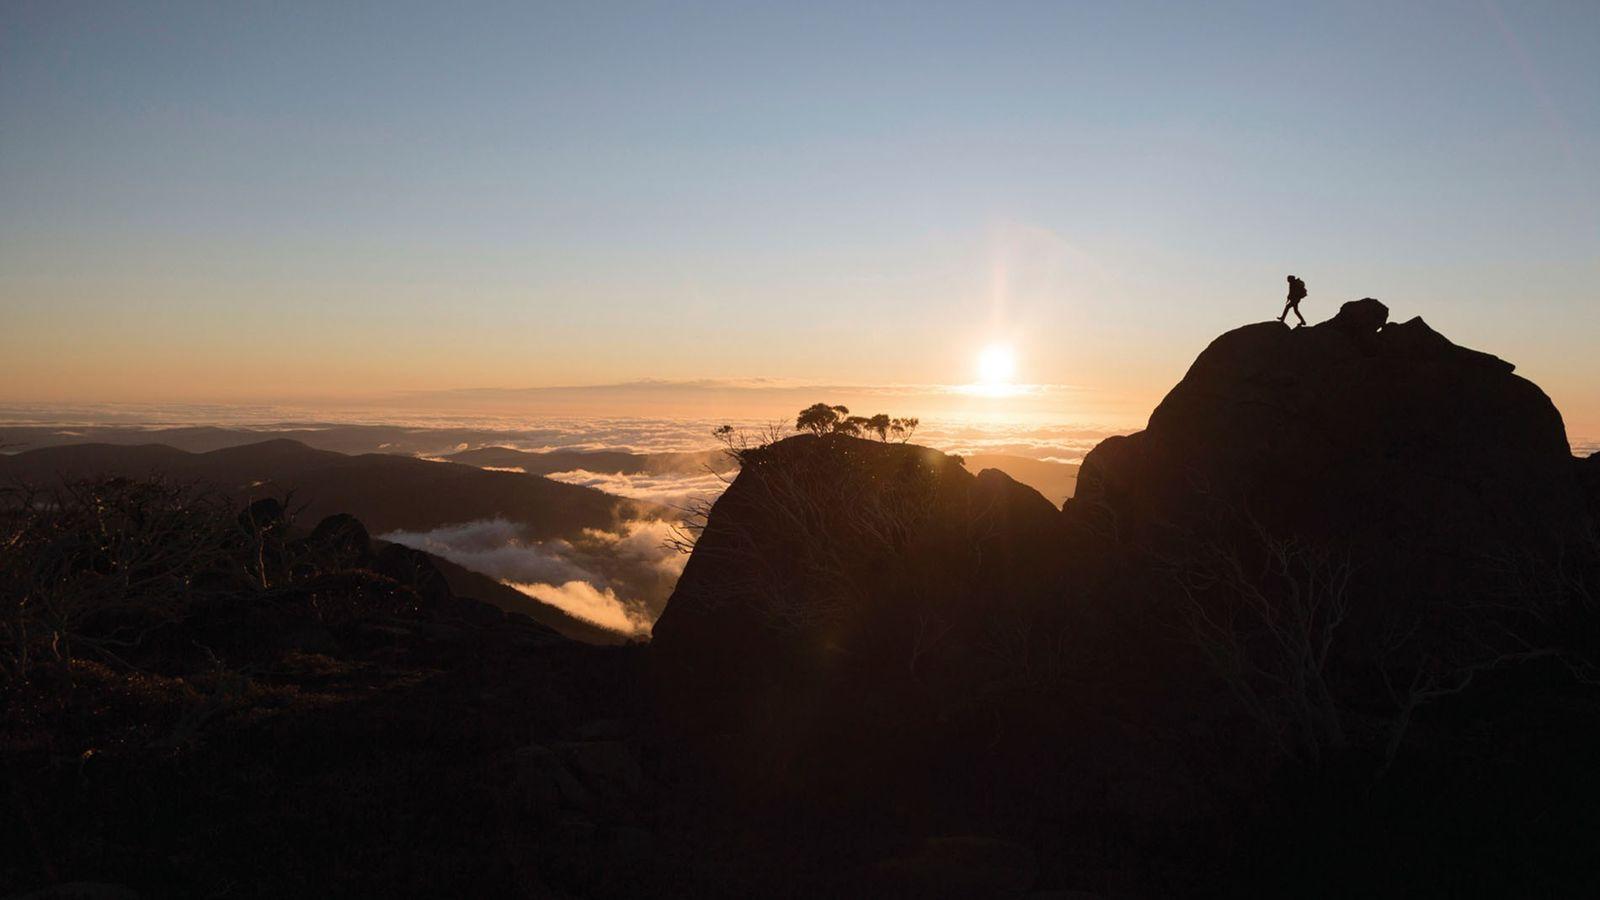 Sunset at Kosciuszko National Park, Kosciuszko, New South Wales, Australia